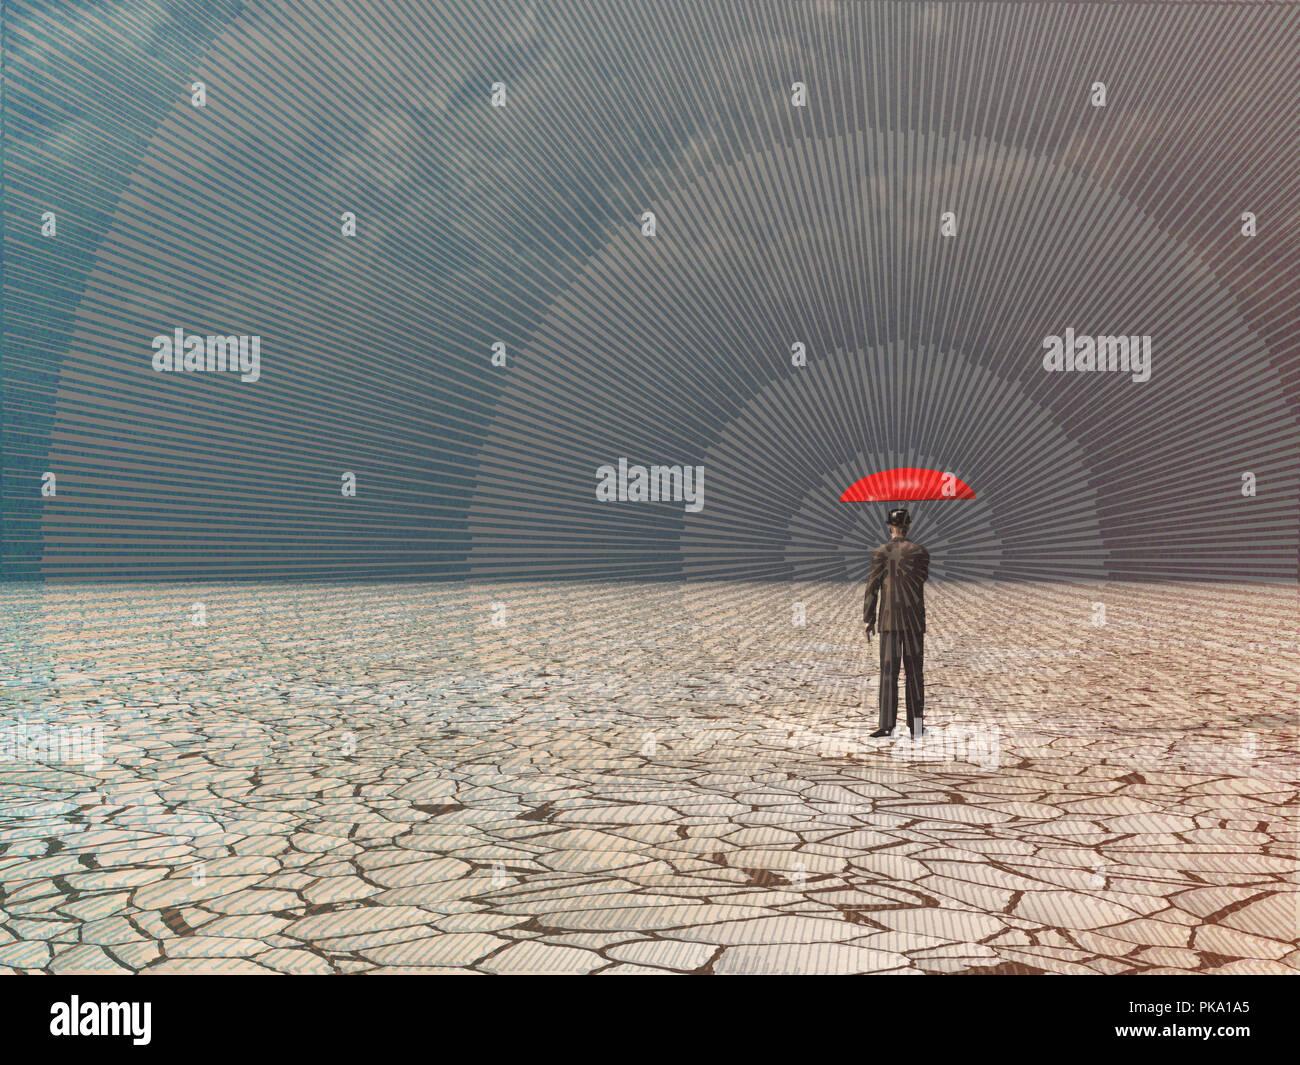 Surreale digitaler Kunst. Mann mit dem roten Regenschirm in trockenen Land unter Gathering Storm. Stockbild